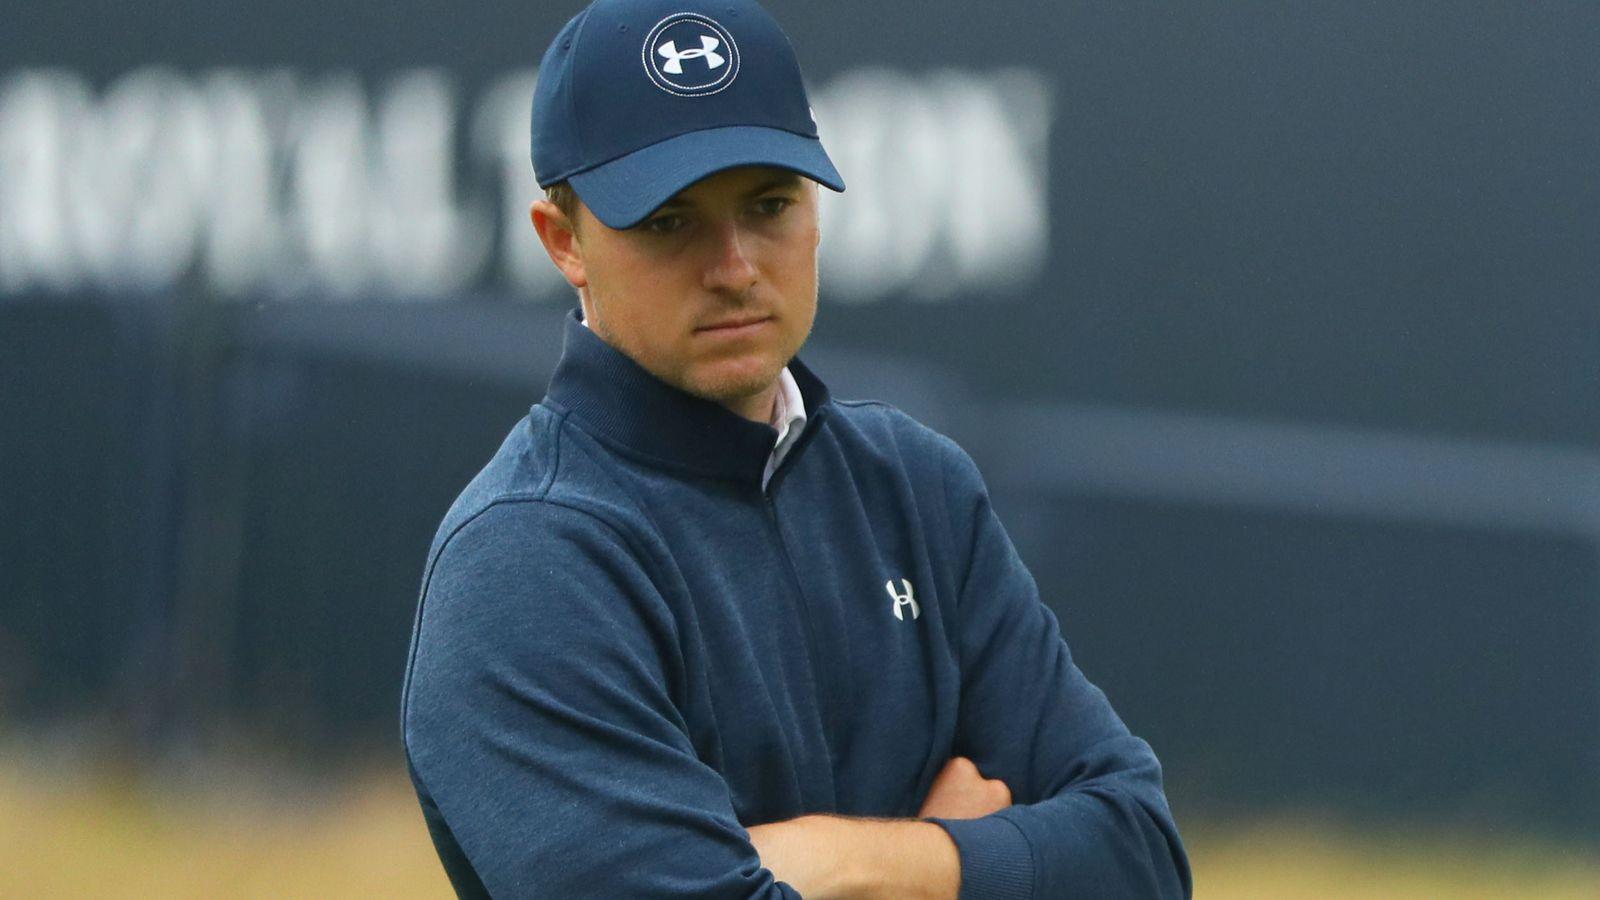 Jordan Spieth对他的高尔夫球比赛充满了负面影响